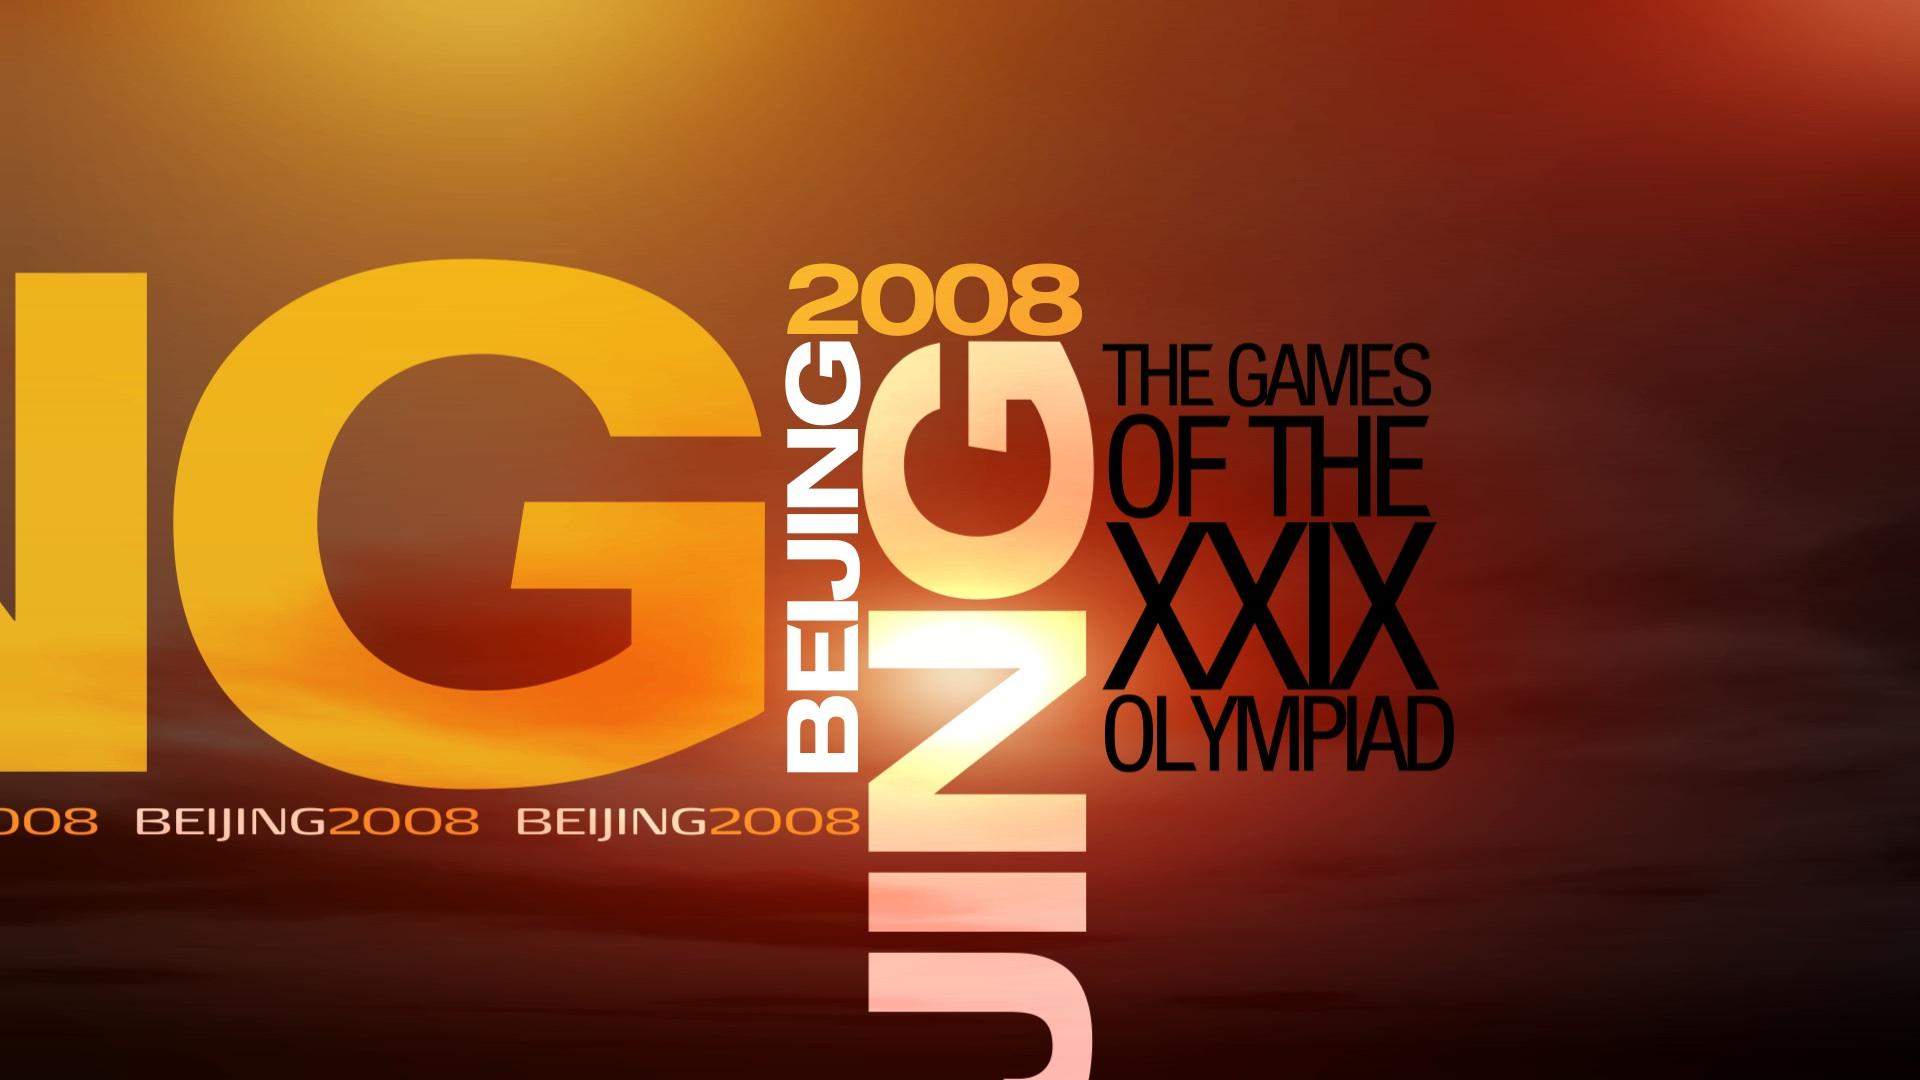 GAMES OF THE XXIX OLYMPIAD - NBC SPORTS & OLYMPICS